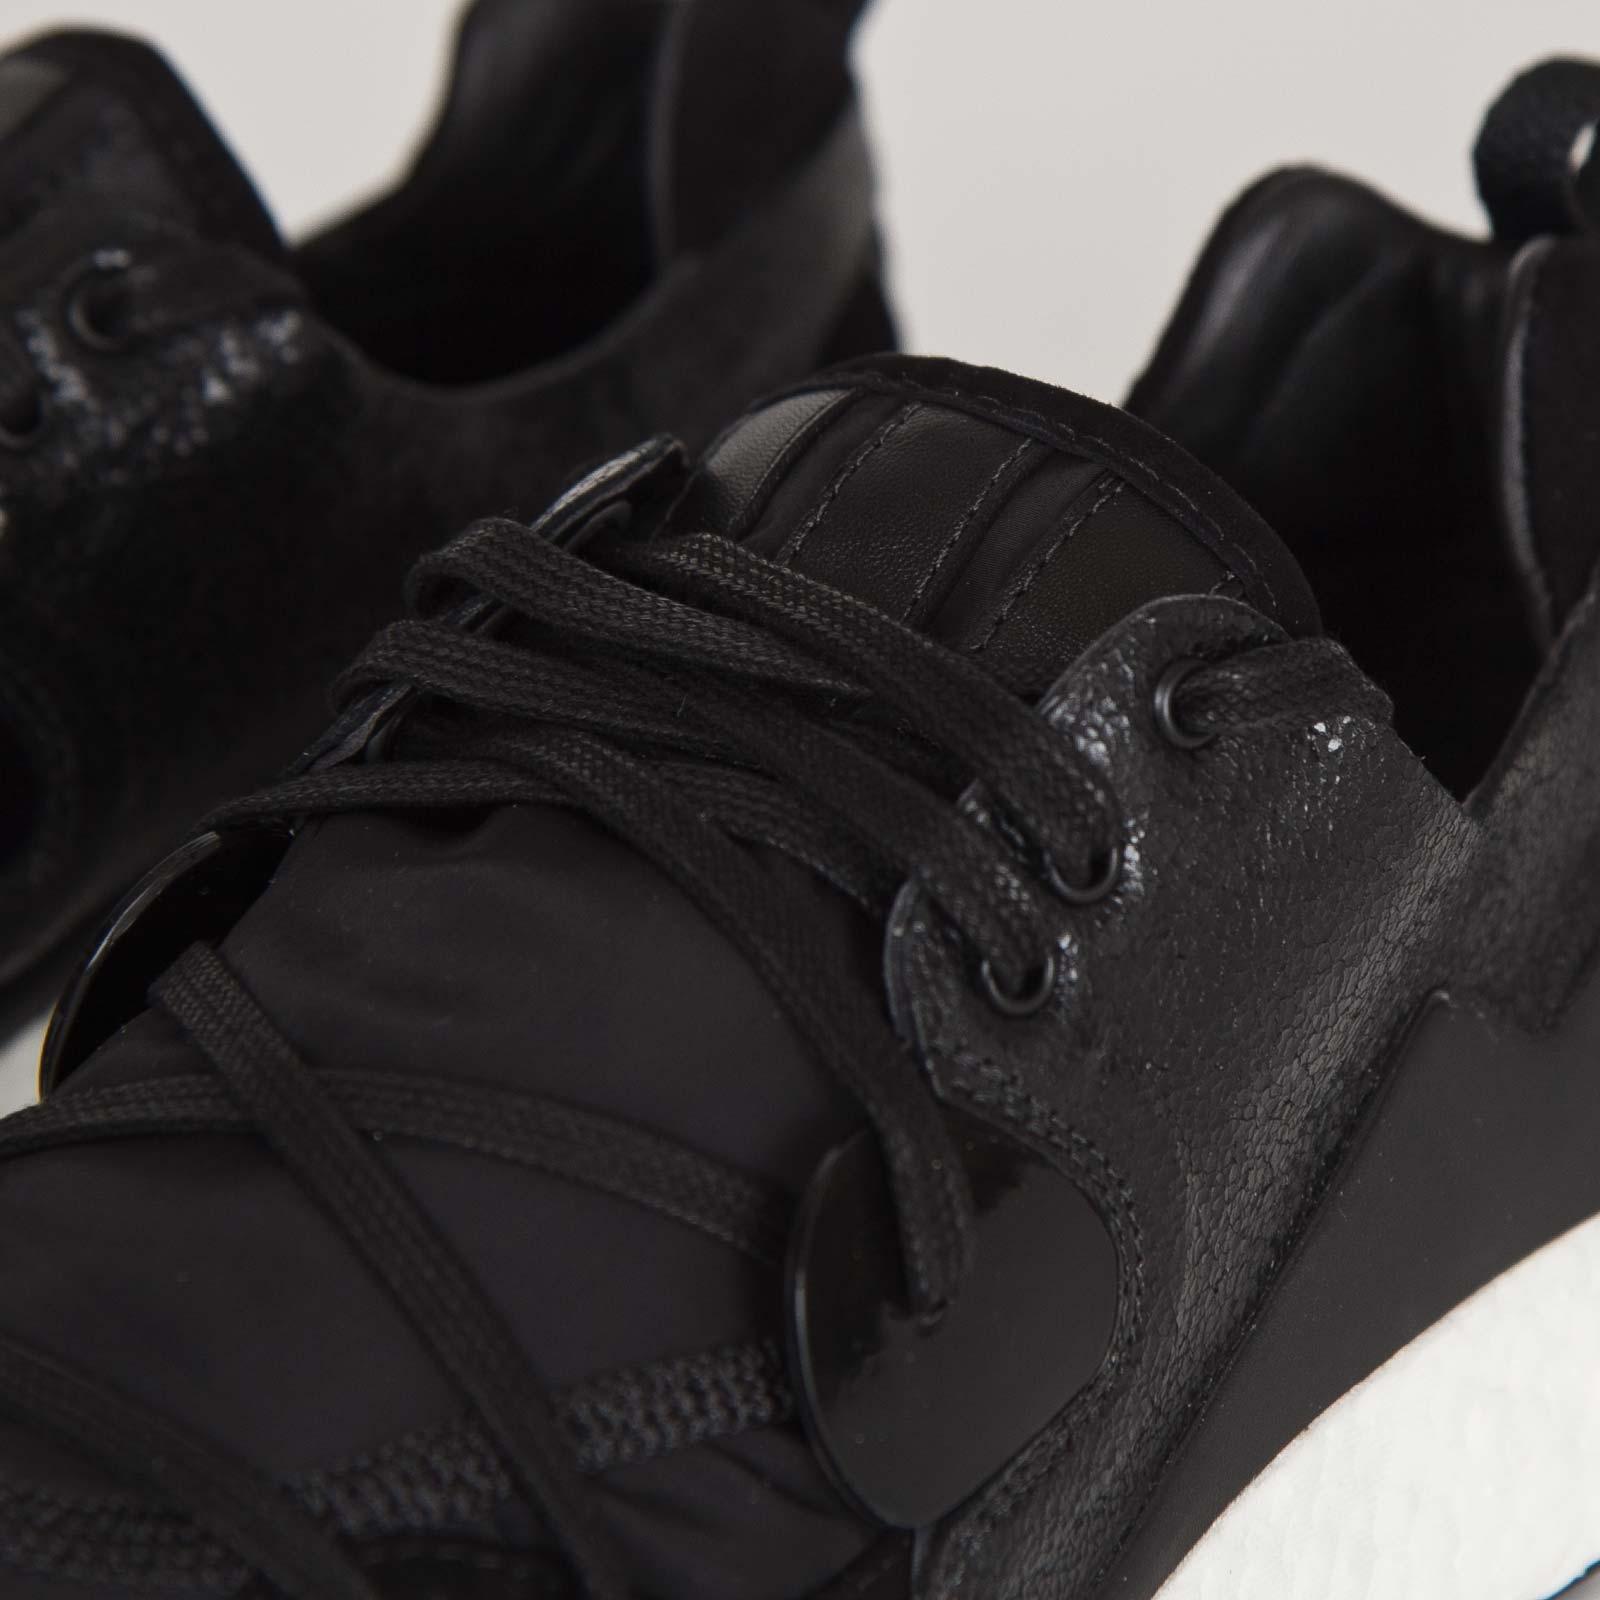 Adidas Originals Black Y3 Femme Boost Lace Trainers